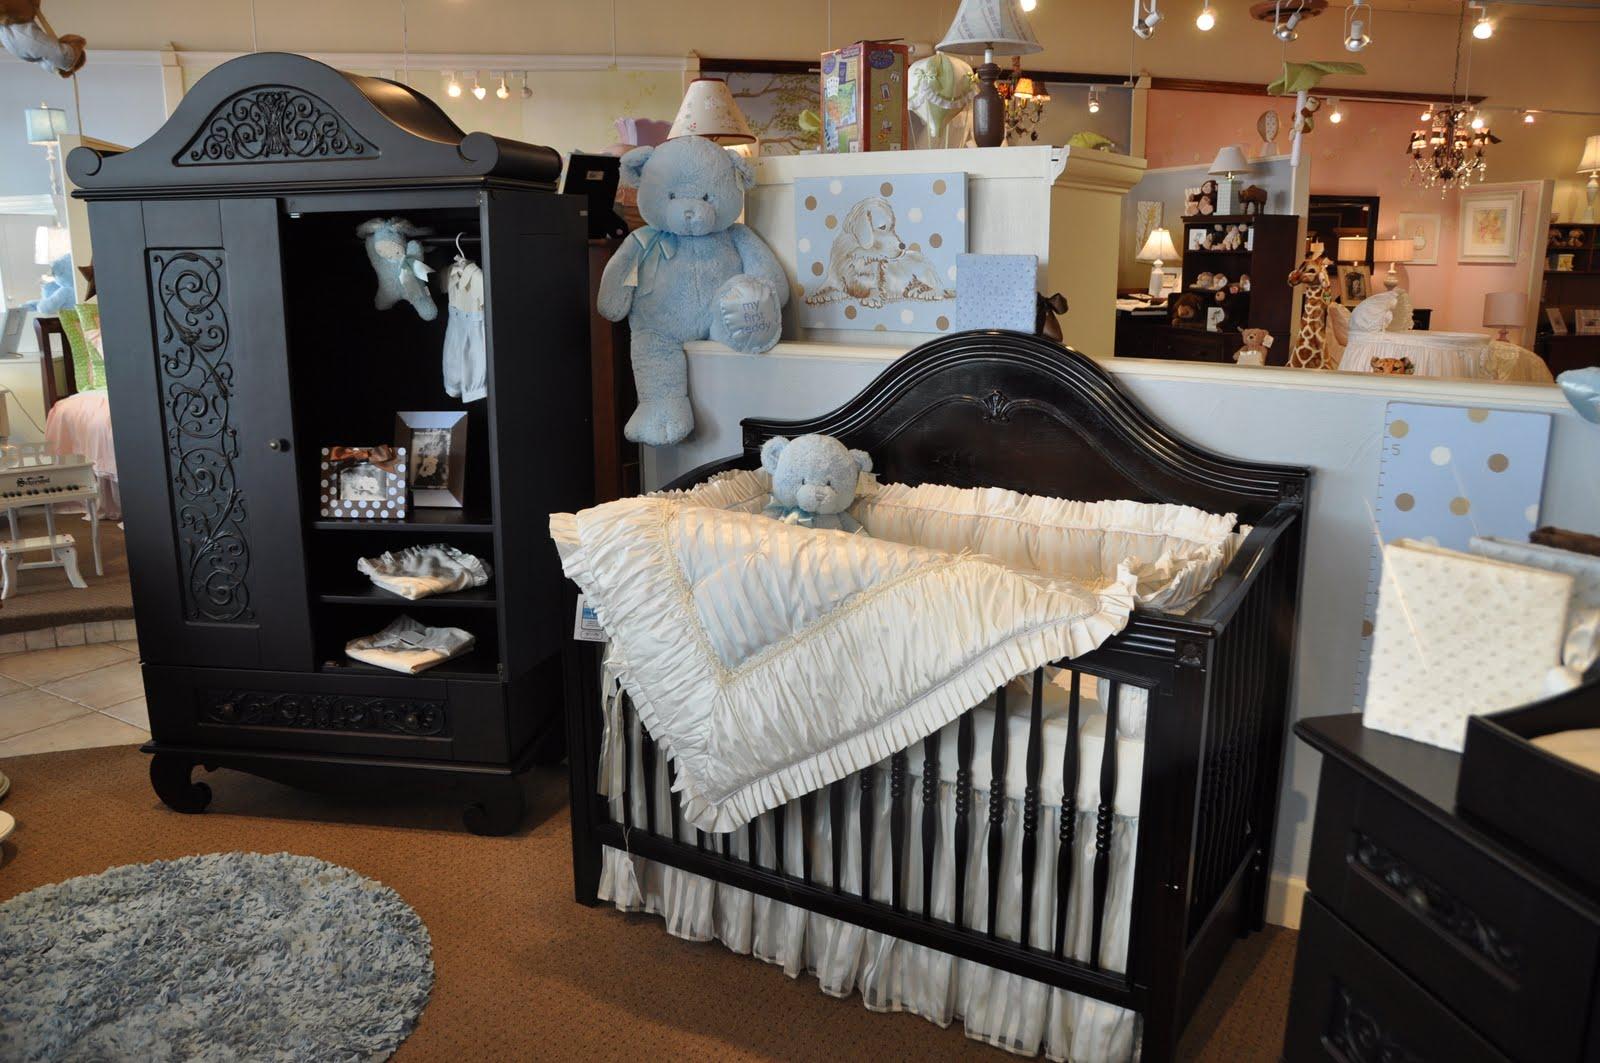 Designer Baby Bedding By Nava S Designs Nava Of Nava S